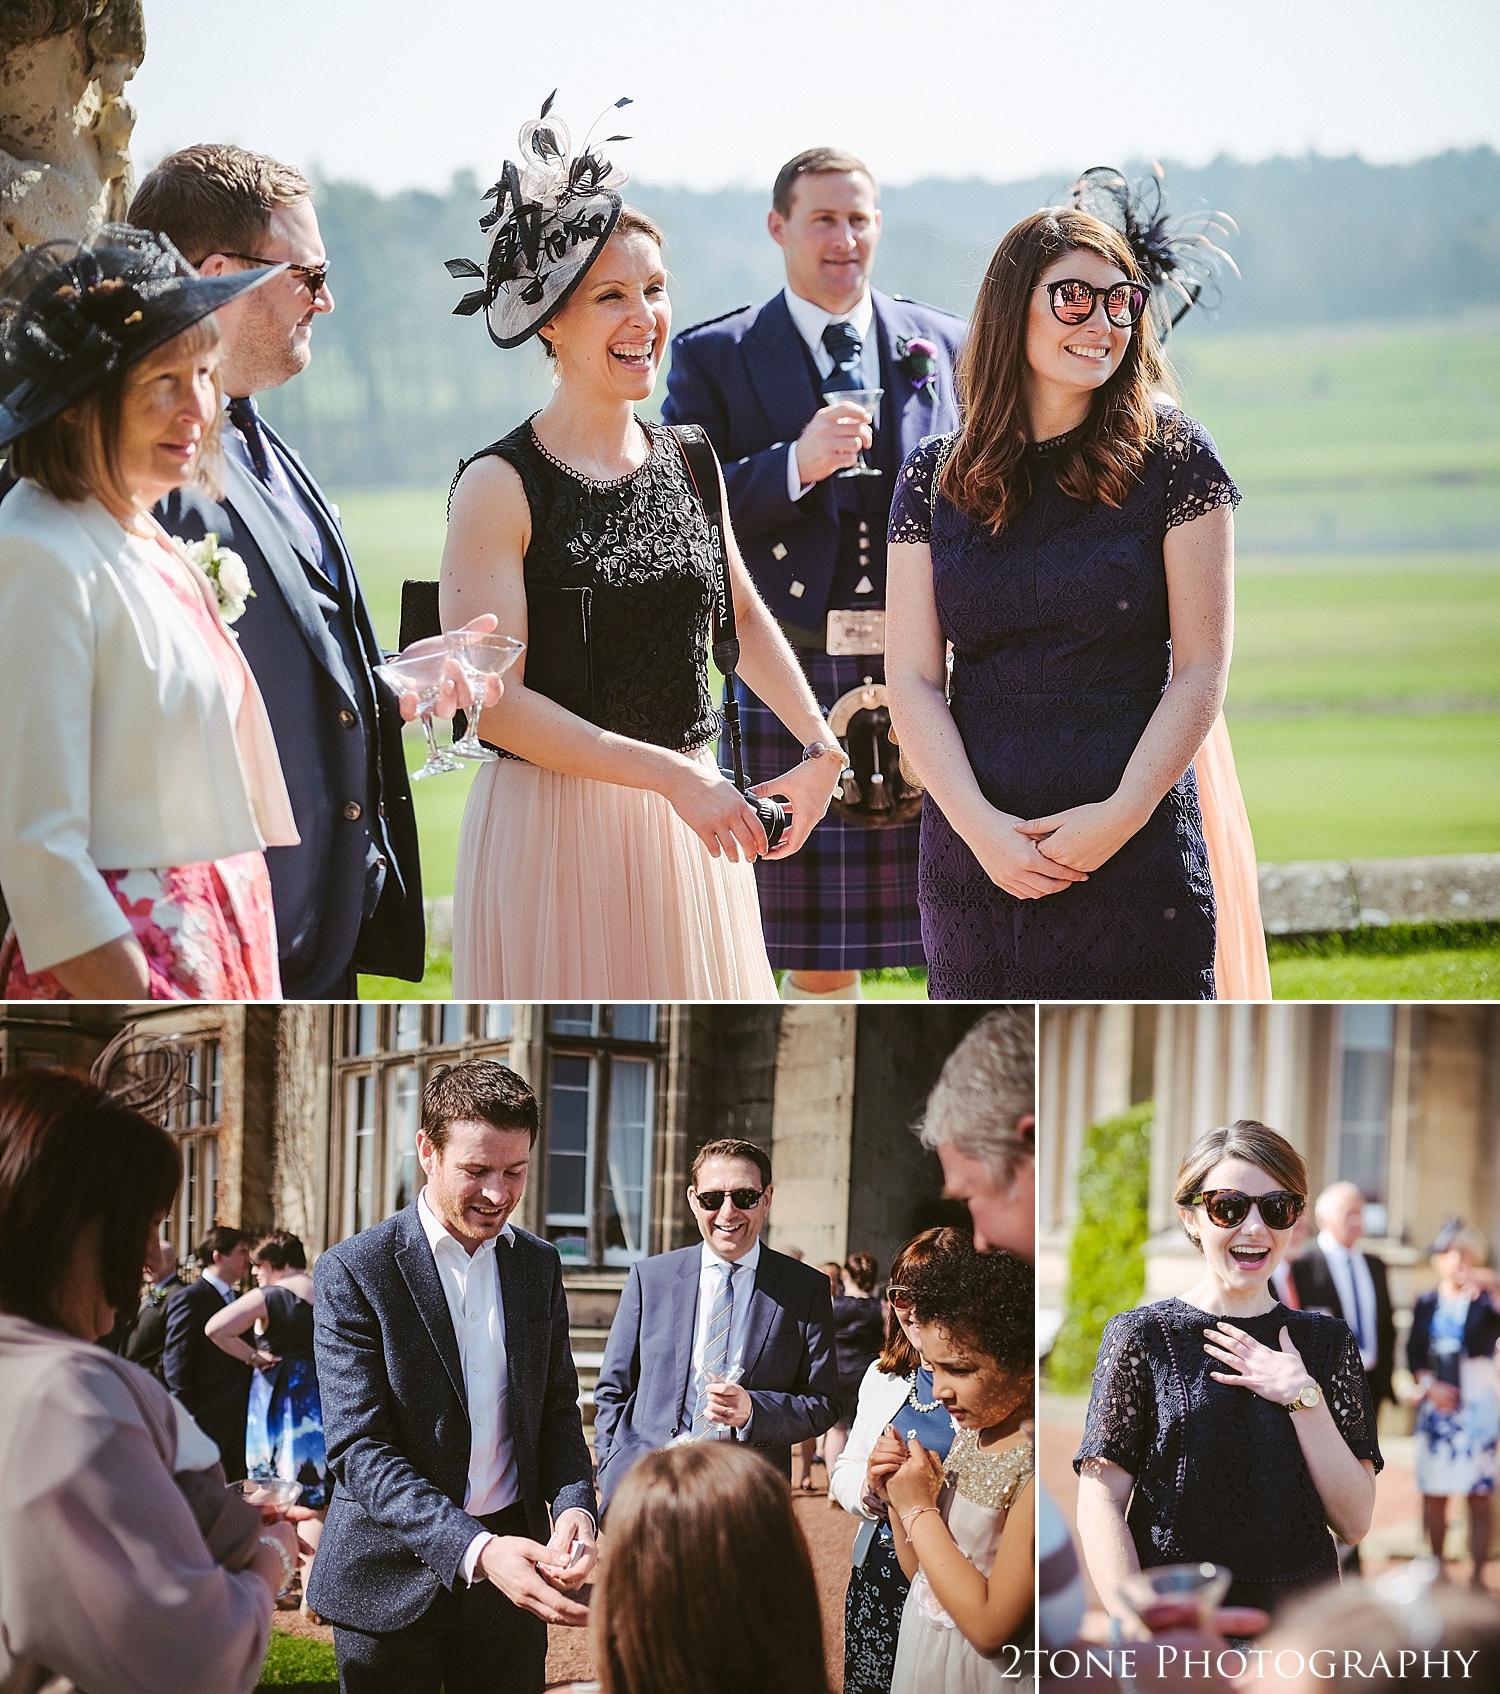 Matfen-Hall-Wedding-Photo 032.jpg